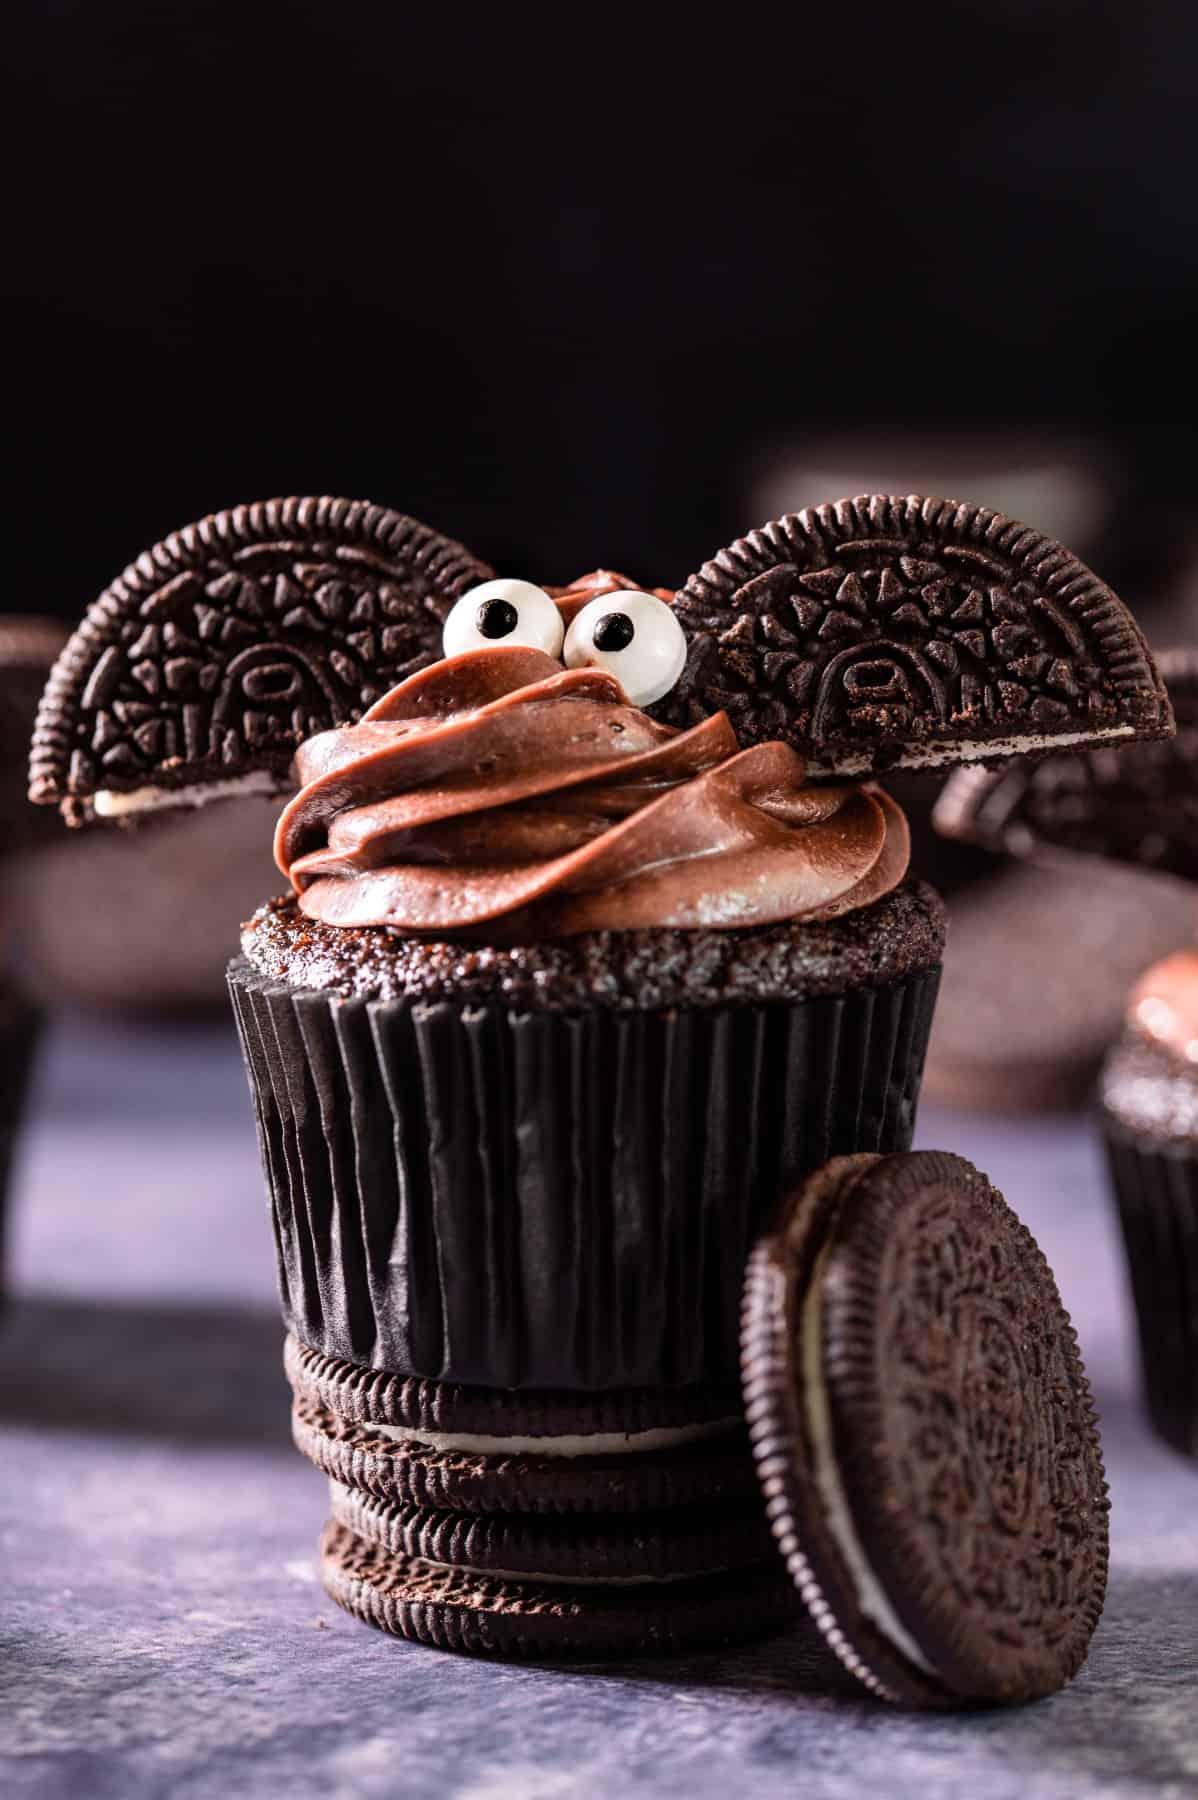 Halloween Bat Cupcakes standing on Oreo cookies